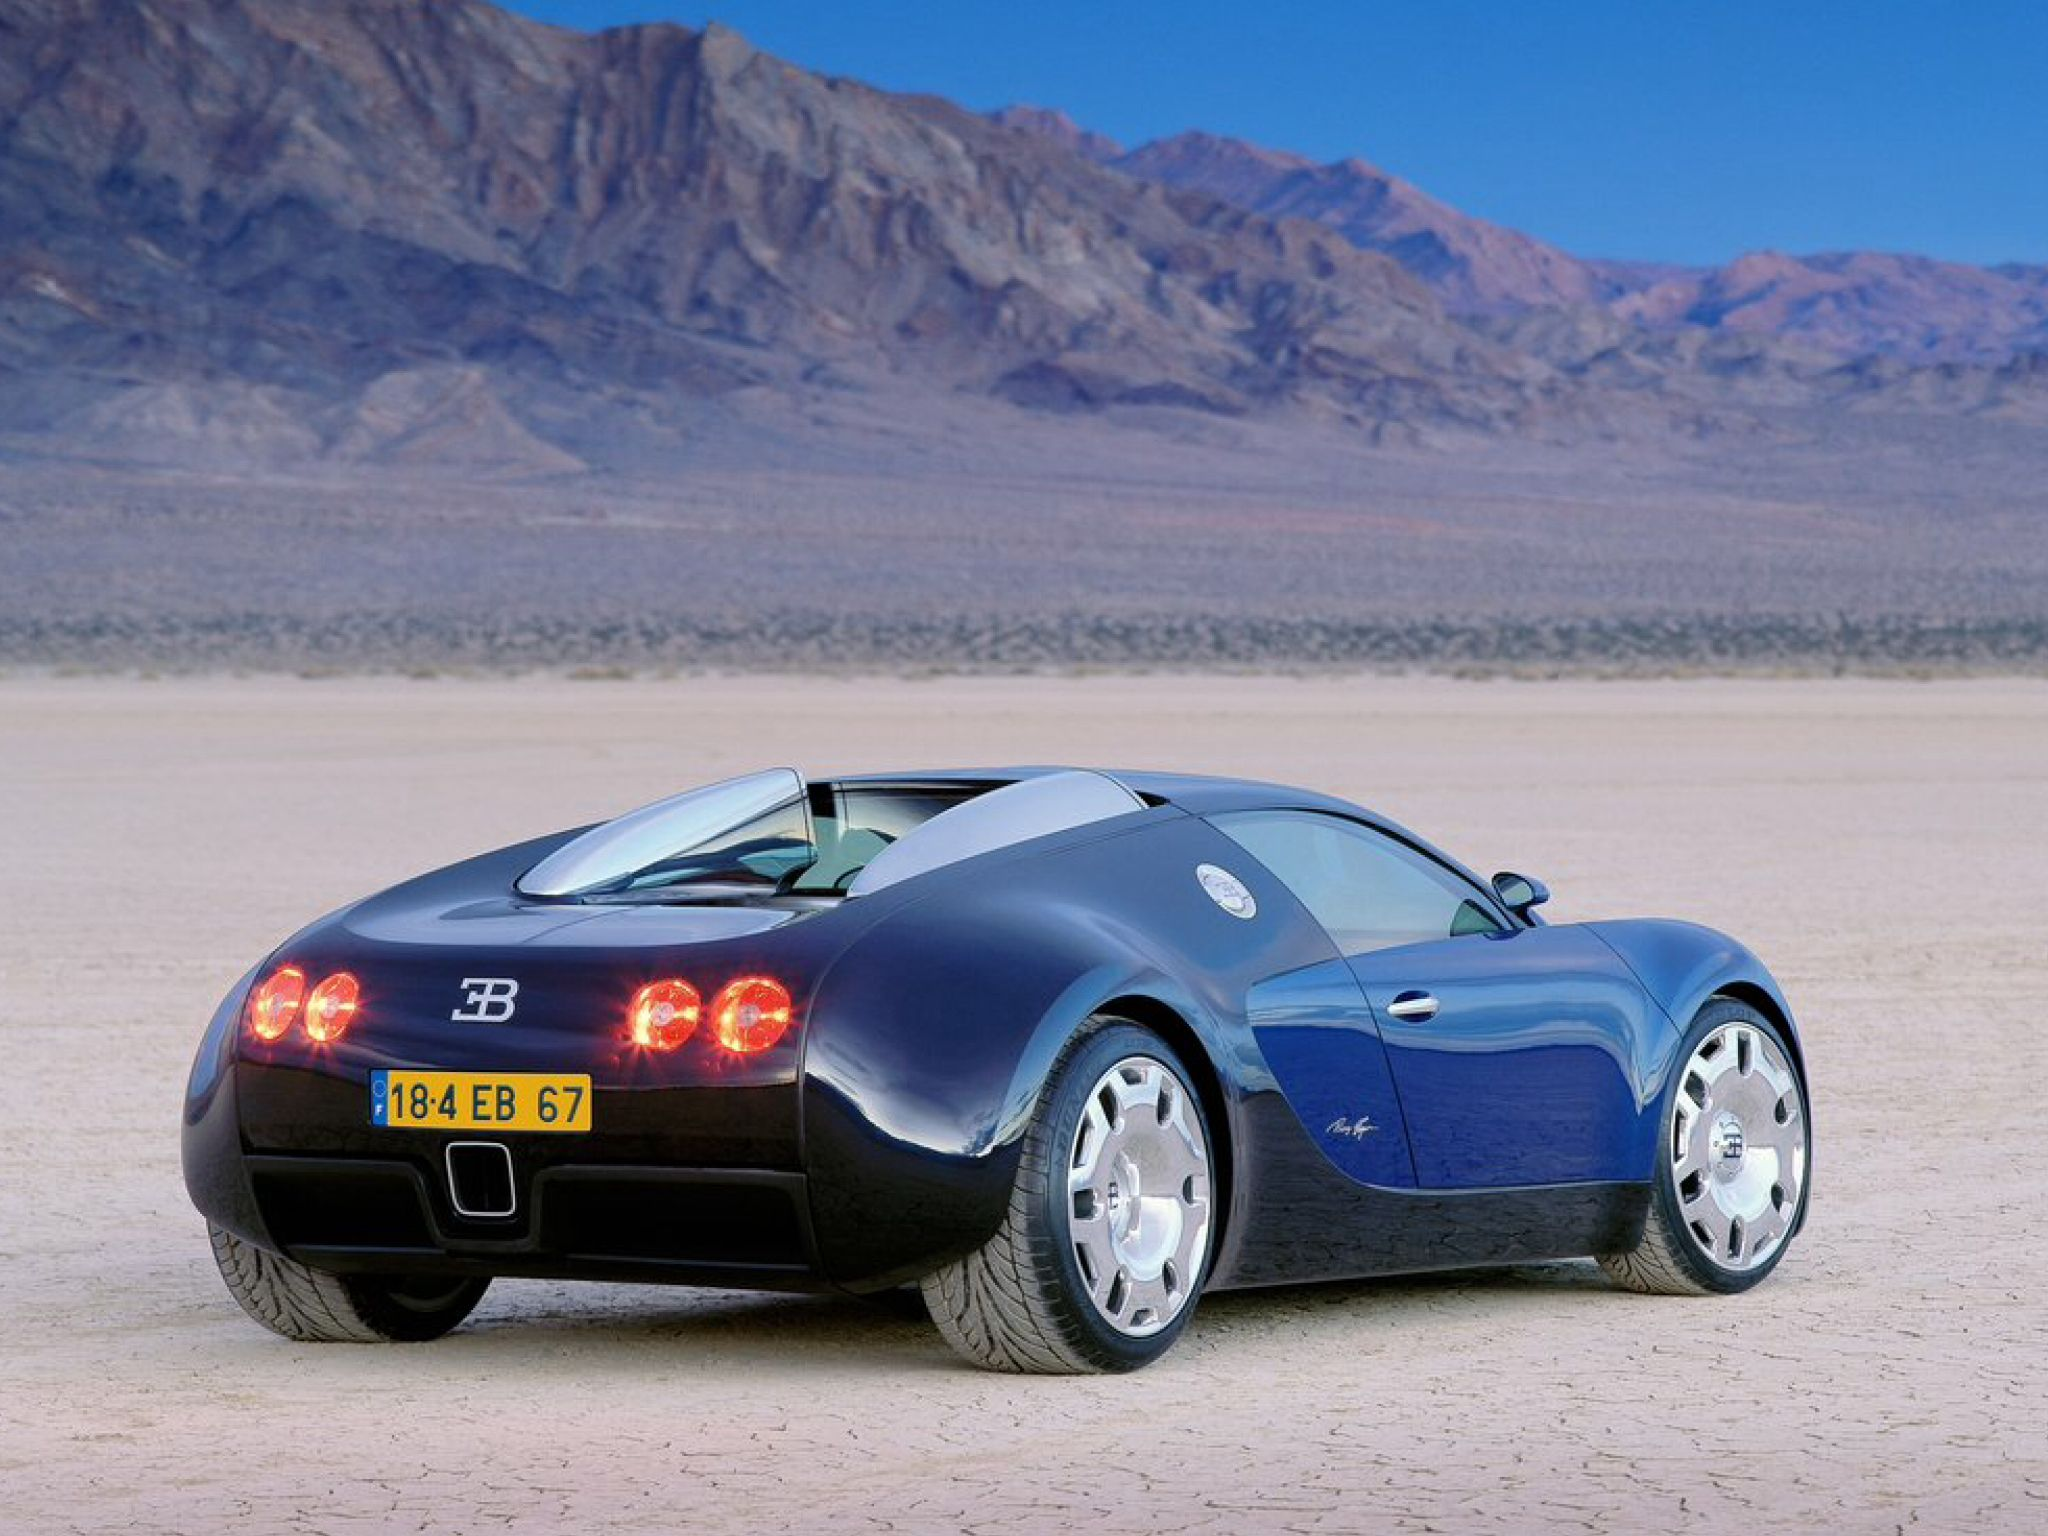 Bugatti Eb 18 4 Veyron Concept